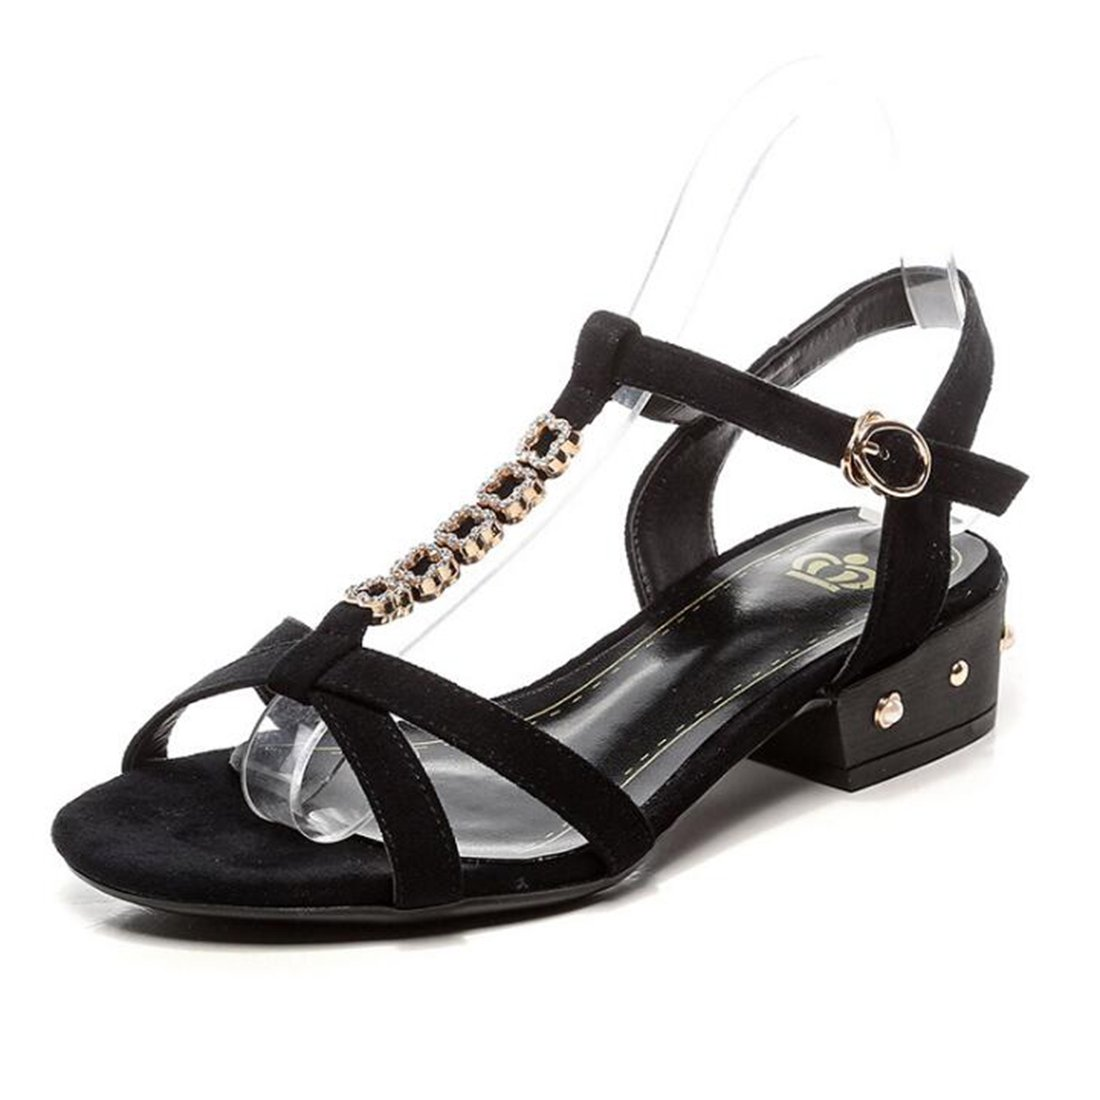 ZHONGST Frauen Sommer Strass Sandalen Casual Mode Wort Schnalle Sandalen  36|Black